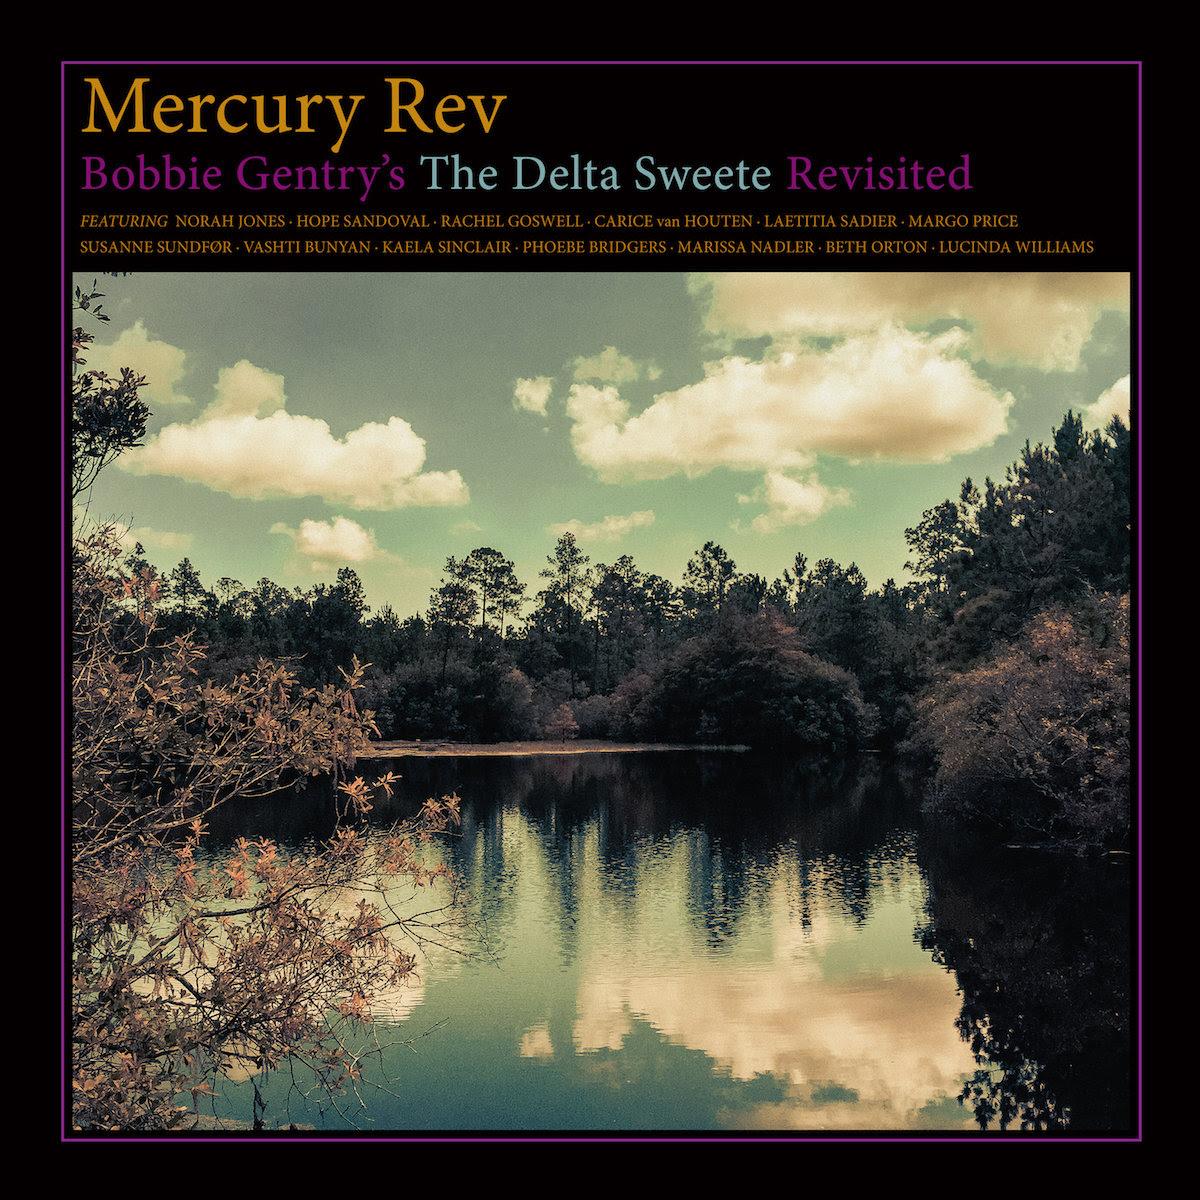 Bobbie Gentry's The Delta Sweete Revisited album cover artwork